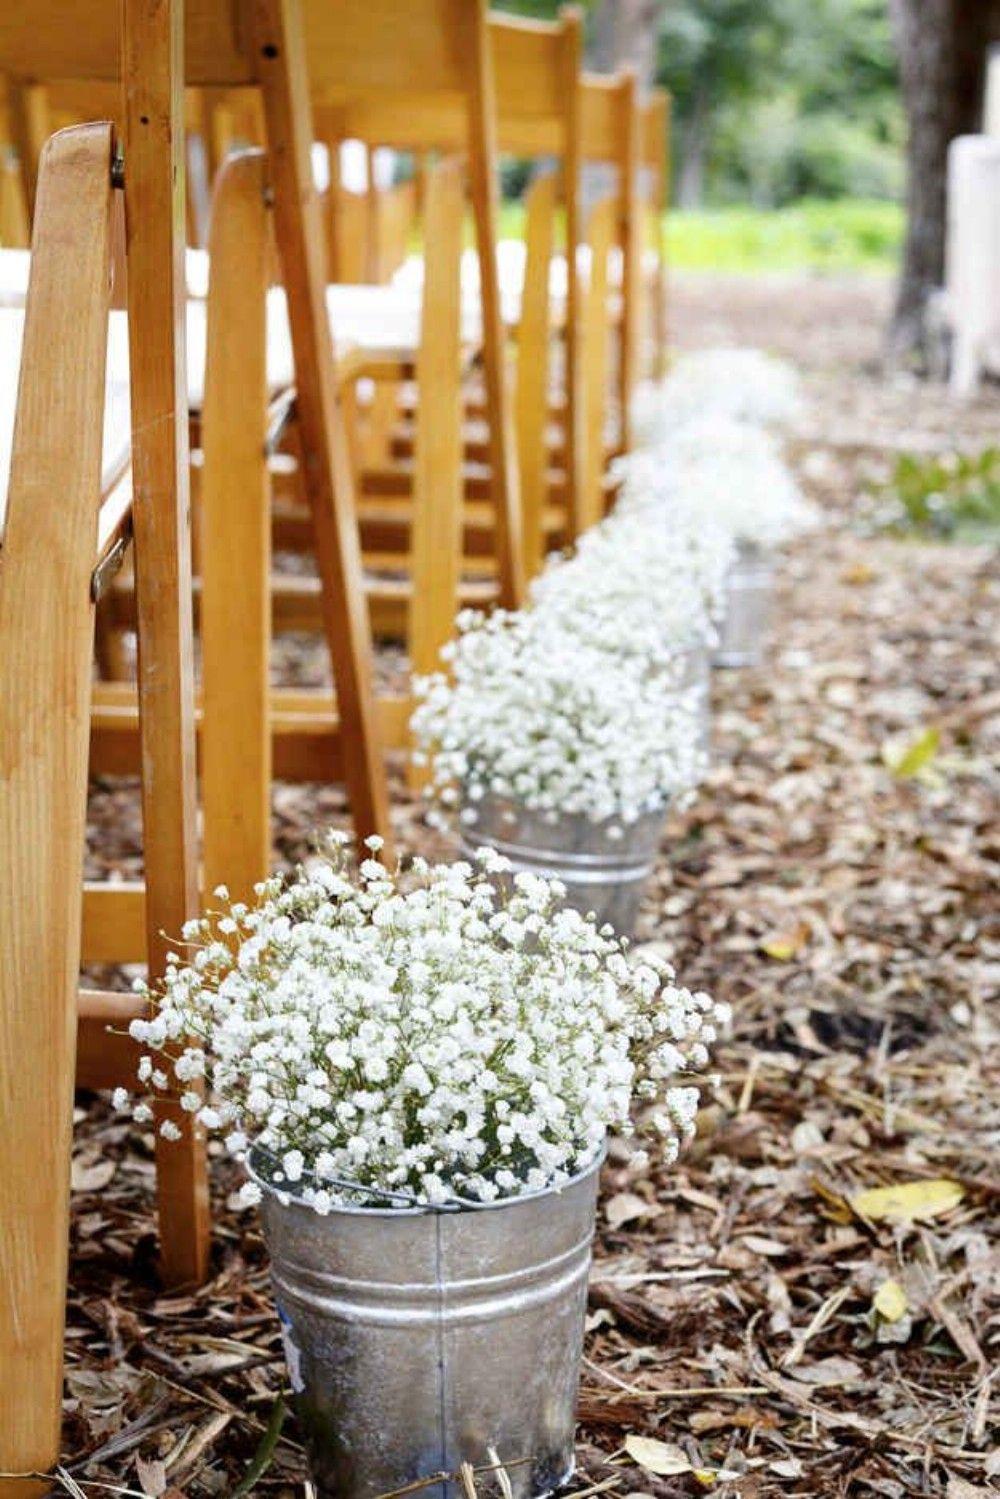 Decor ideas for traditional wedding   BudgetFriendly Outdoor Wedding Ideas for Fall  Halloweeeeen